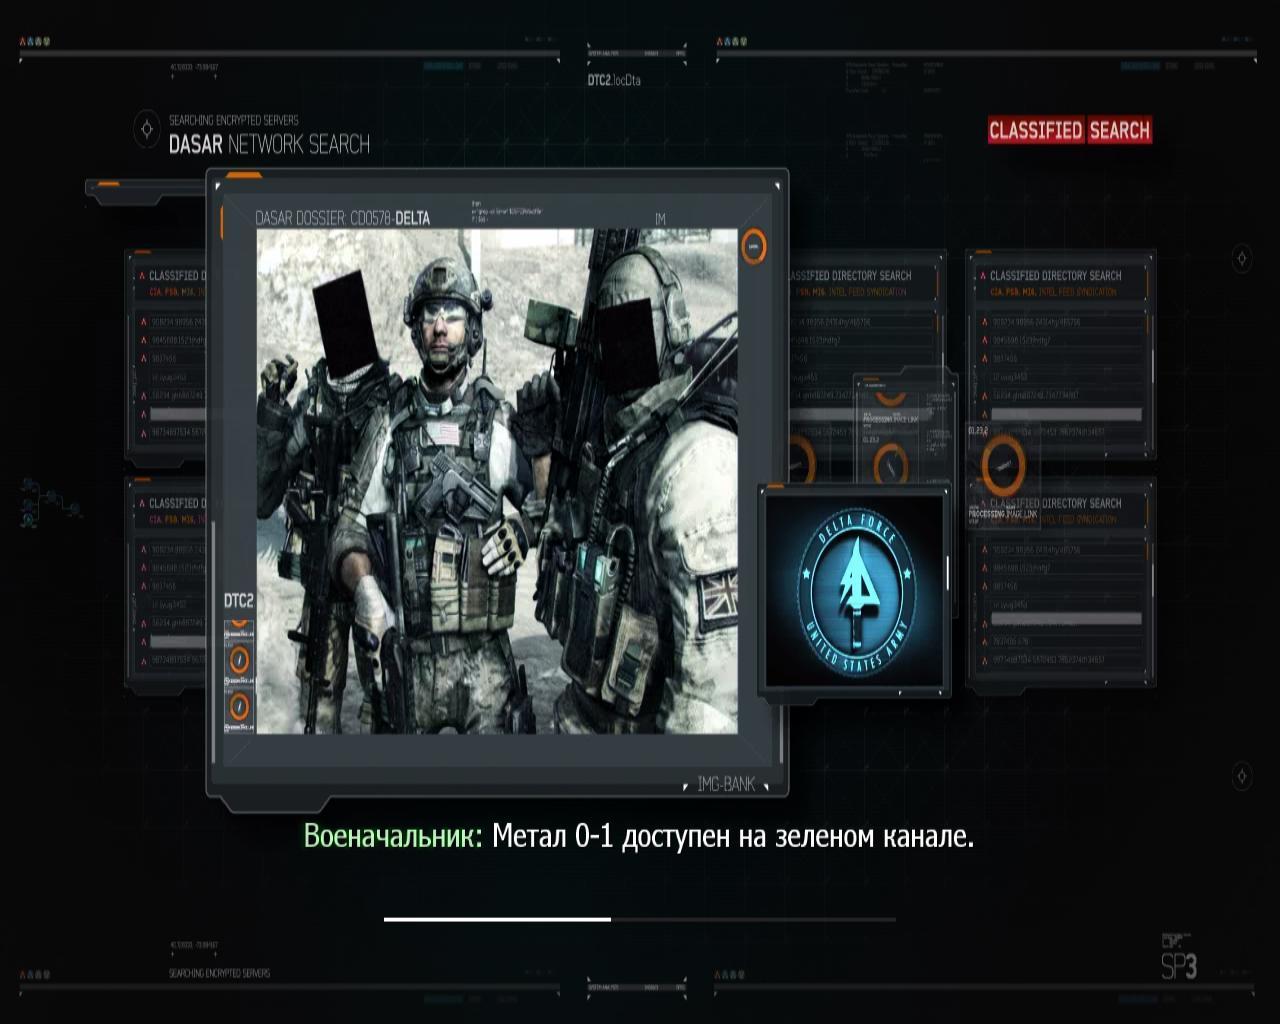 Call of duty modern warfare multiplayer crack